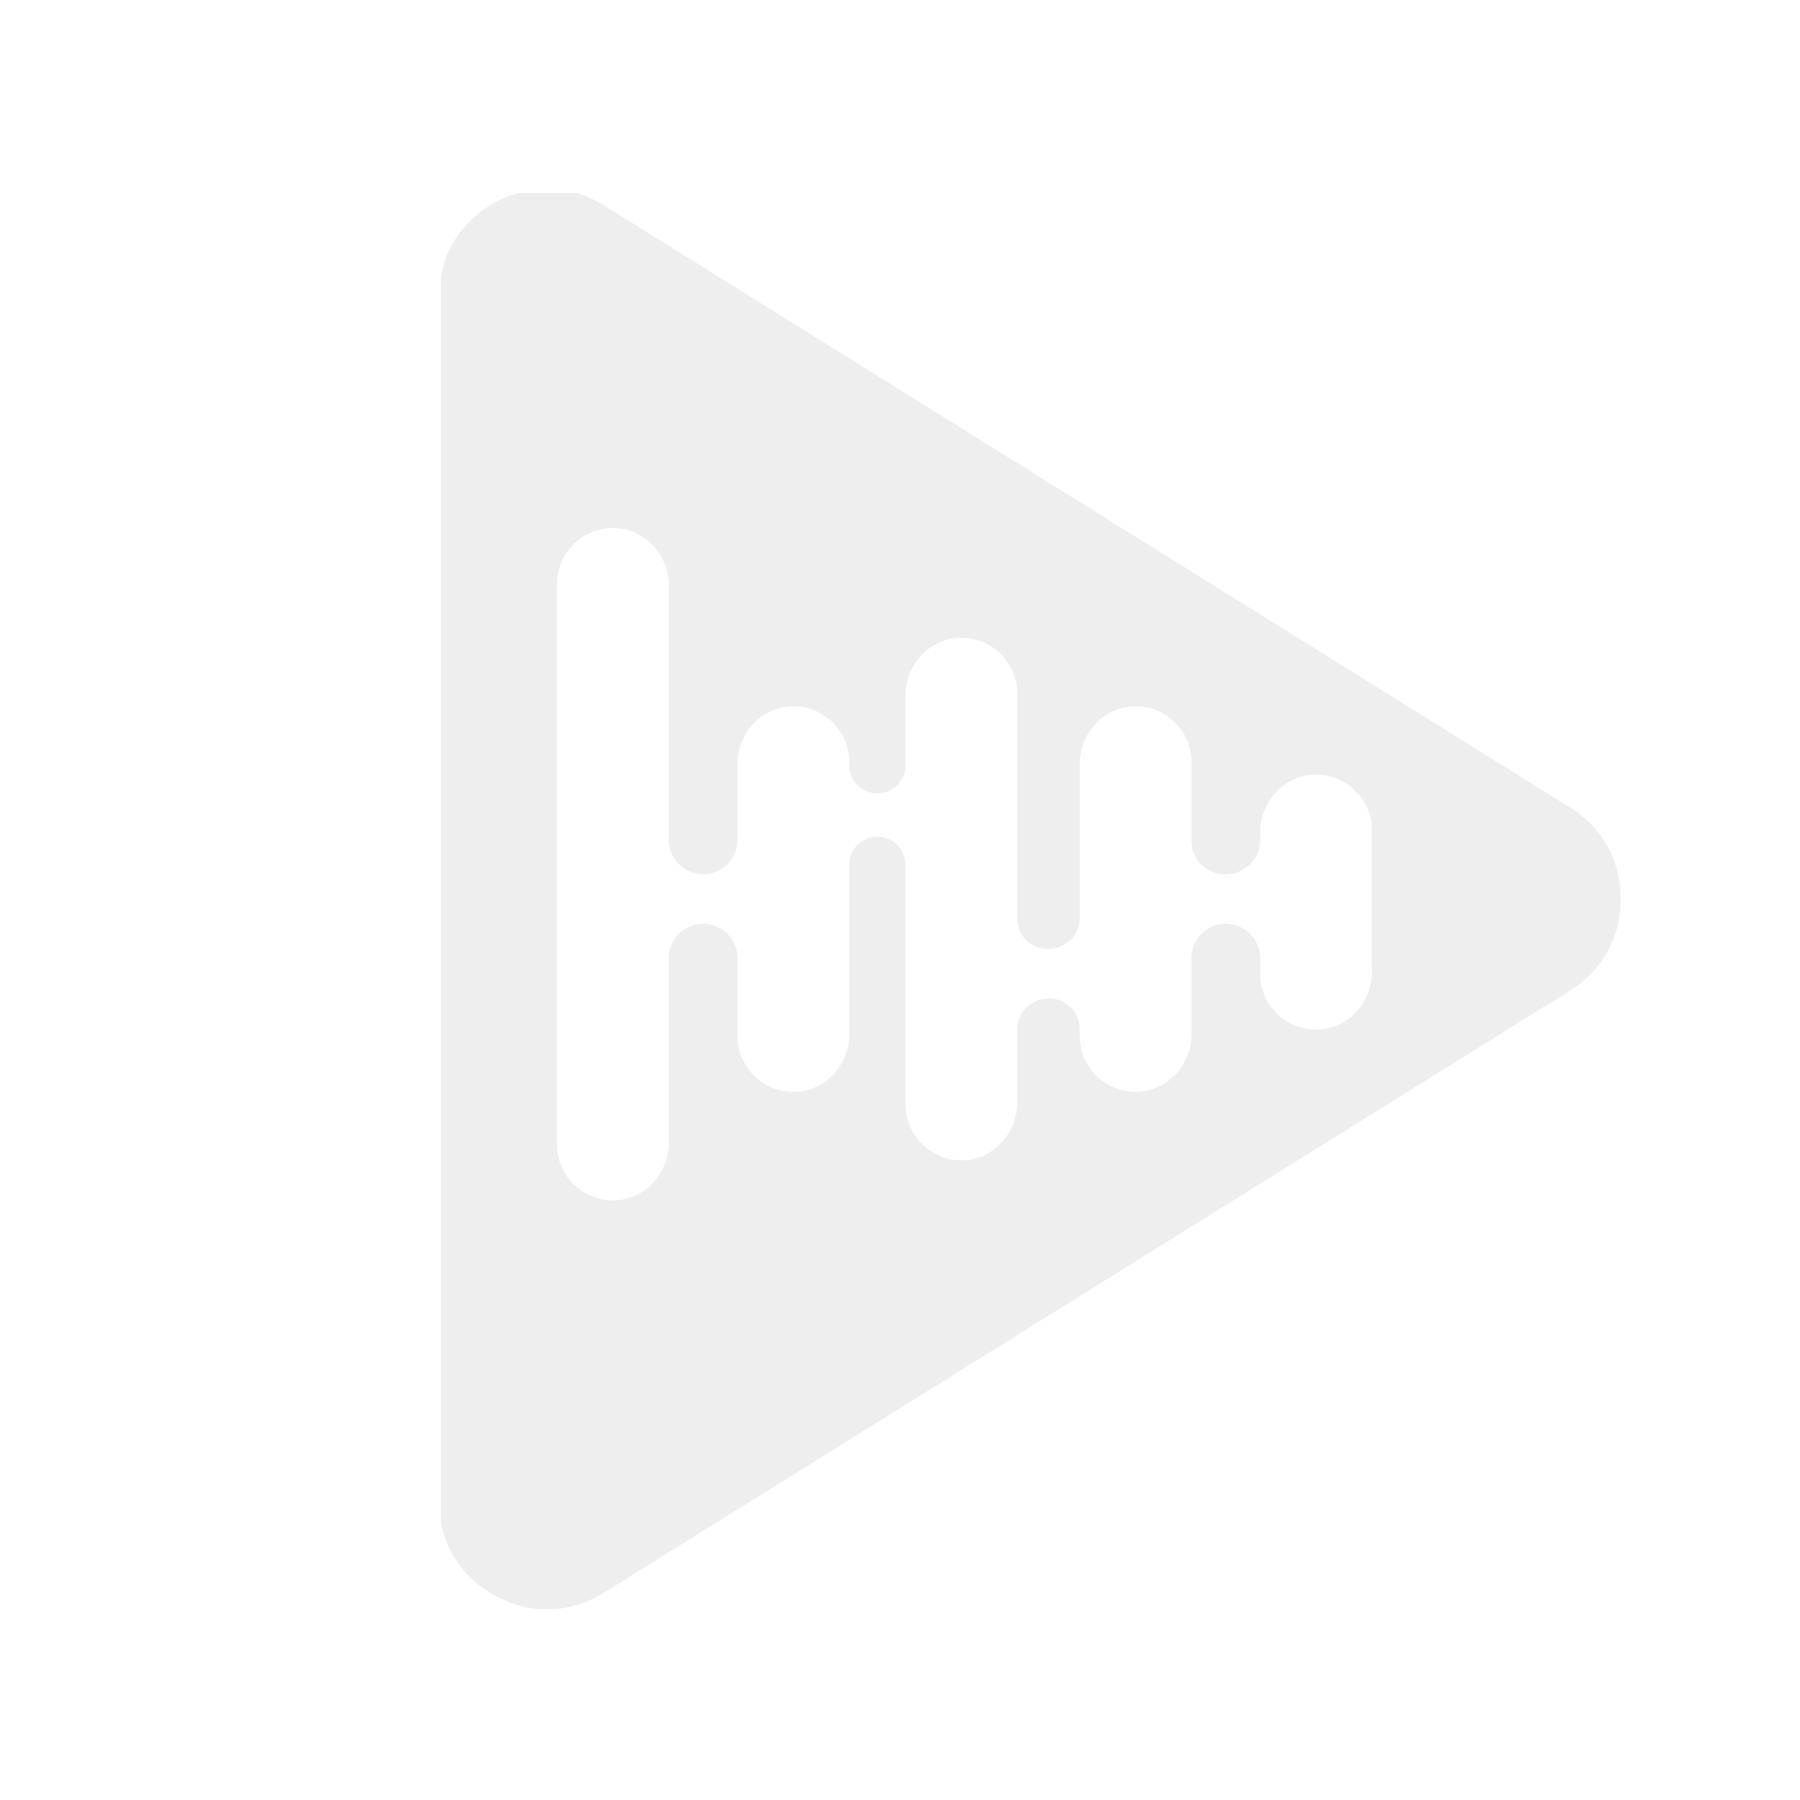 Audison APBMW-E91-HIFI